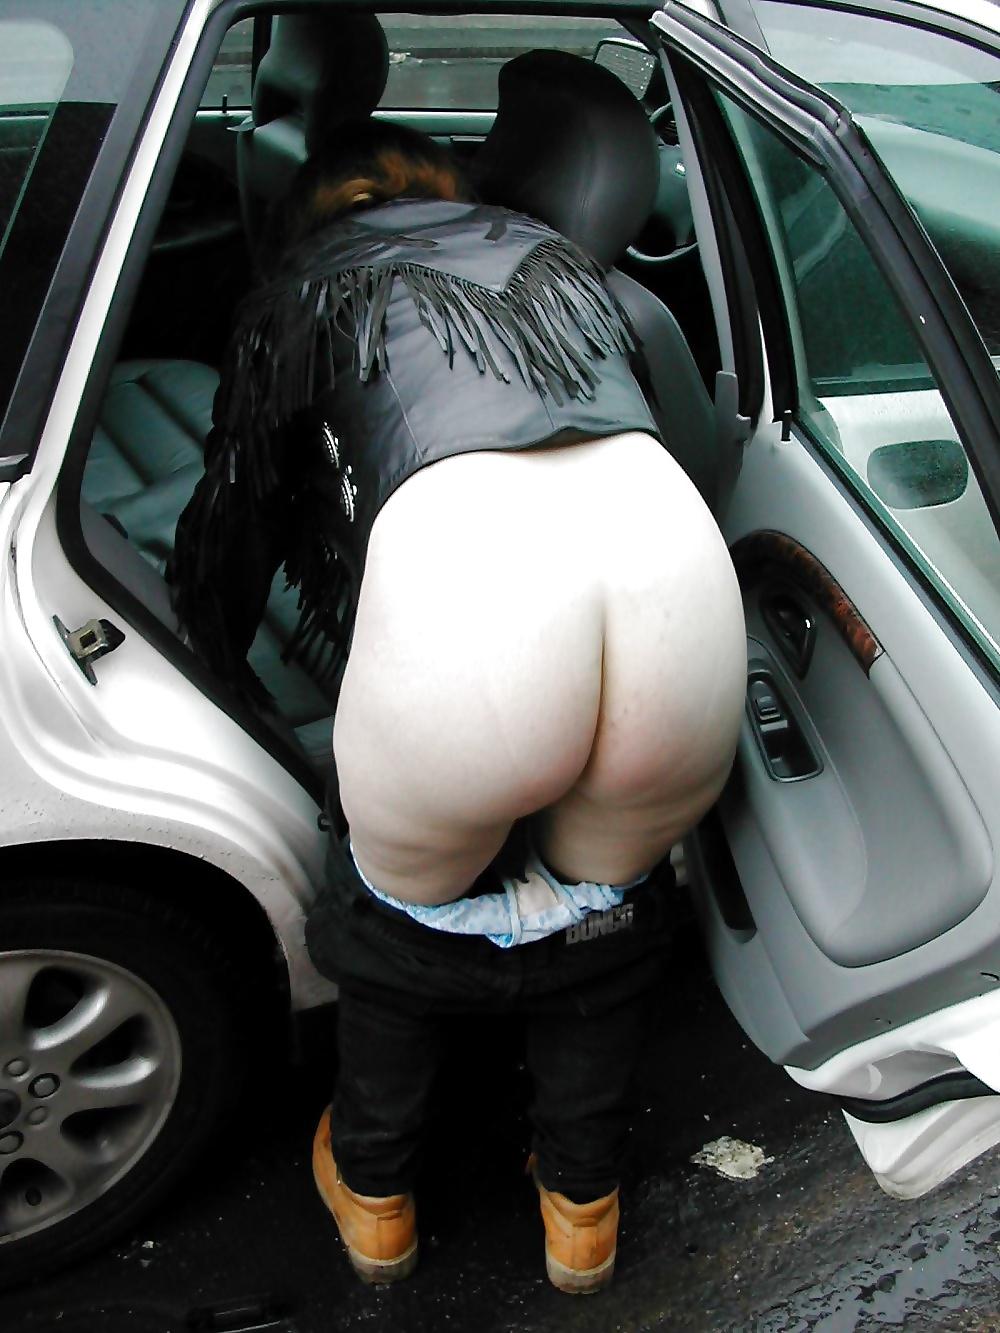 Trunked ass